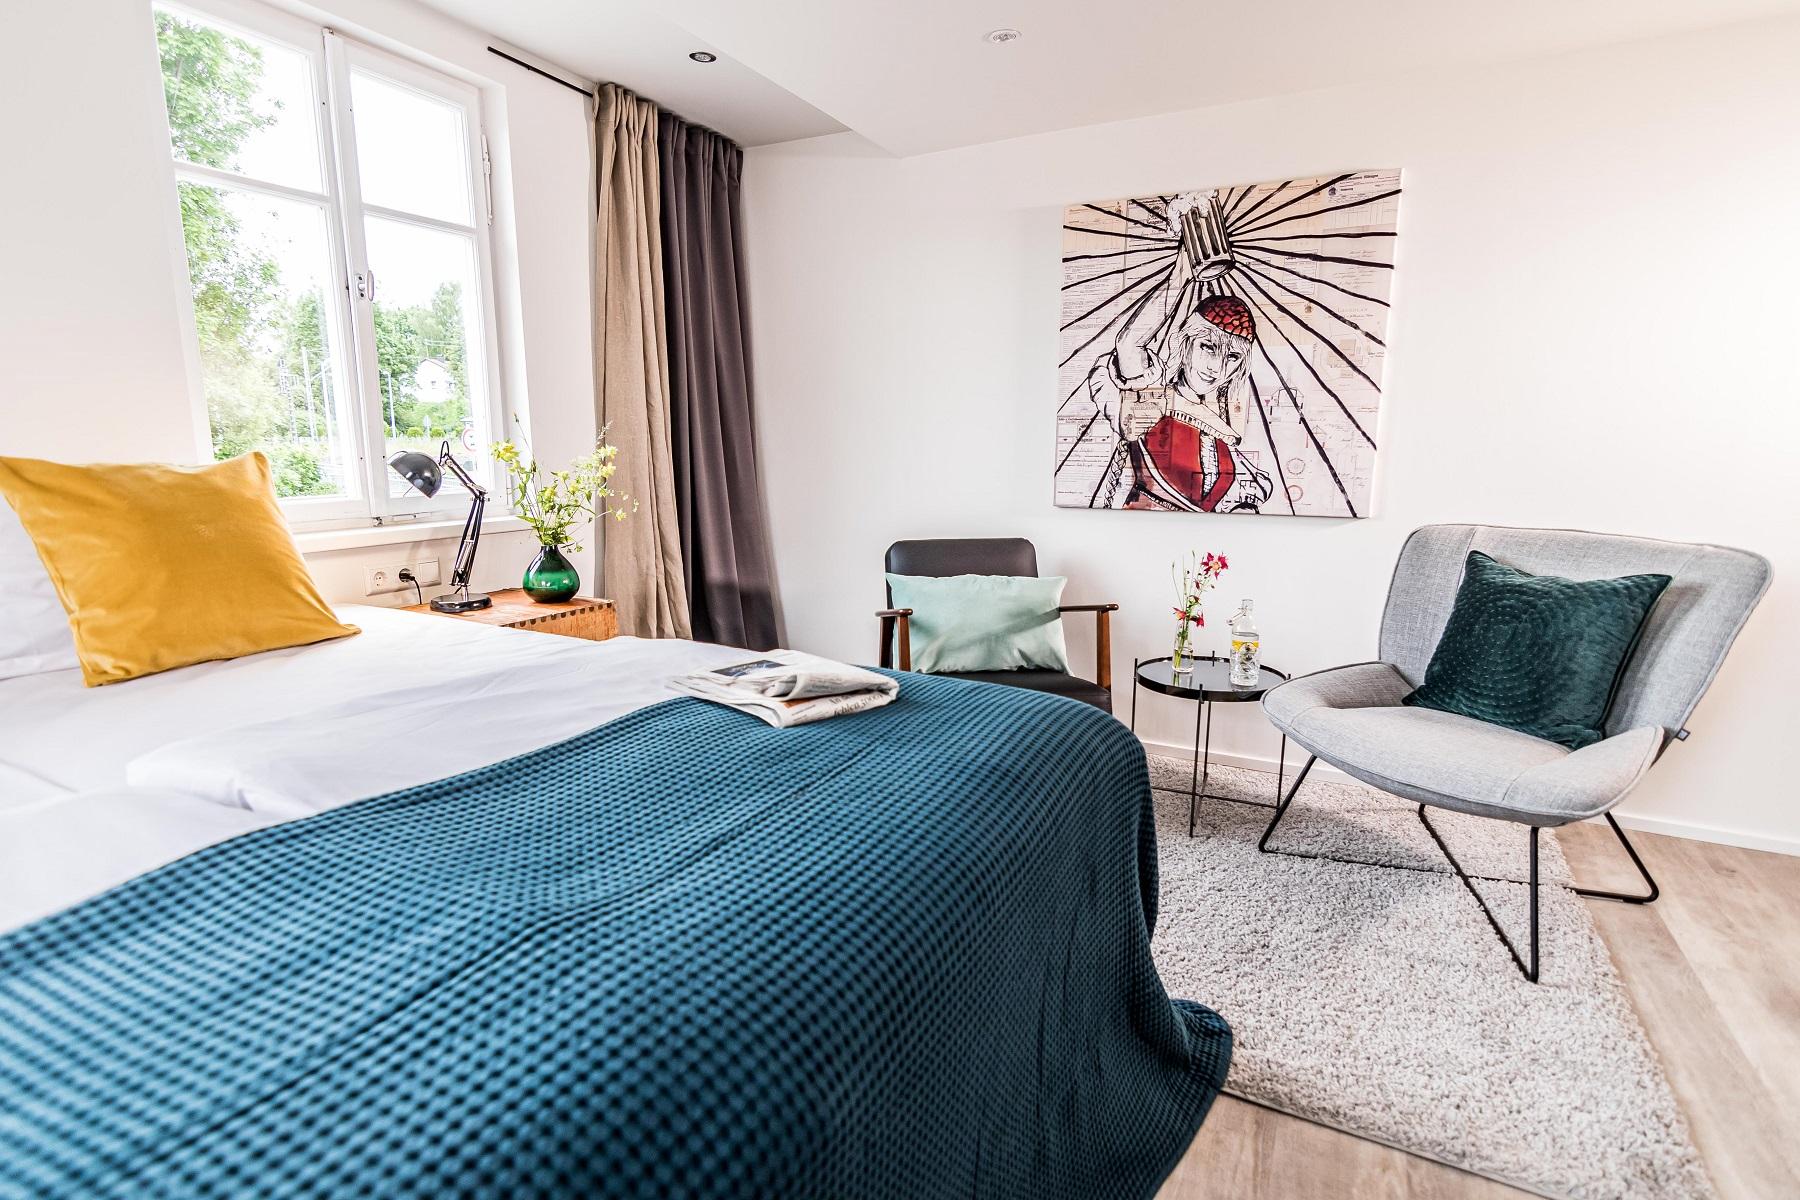 Hotel Das Q in Aldingen bei Villingen-Schwenningen